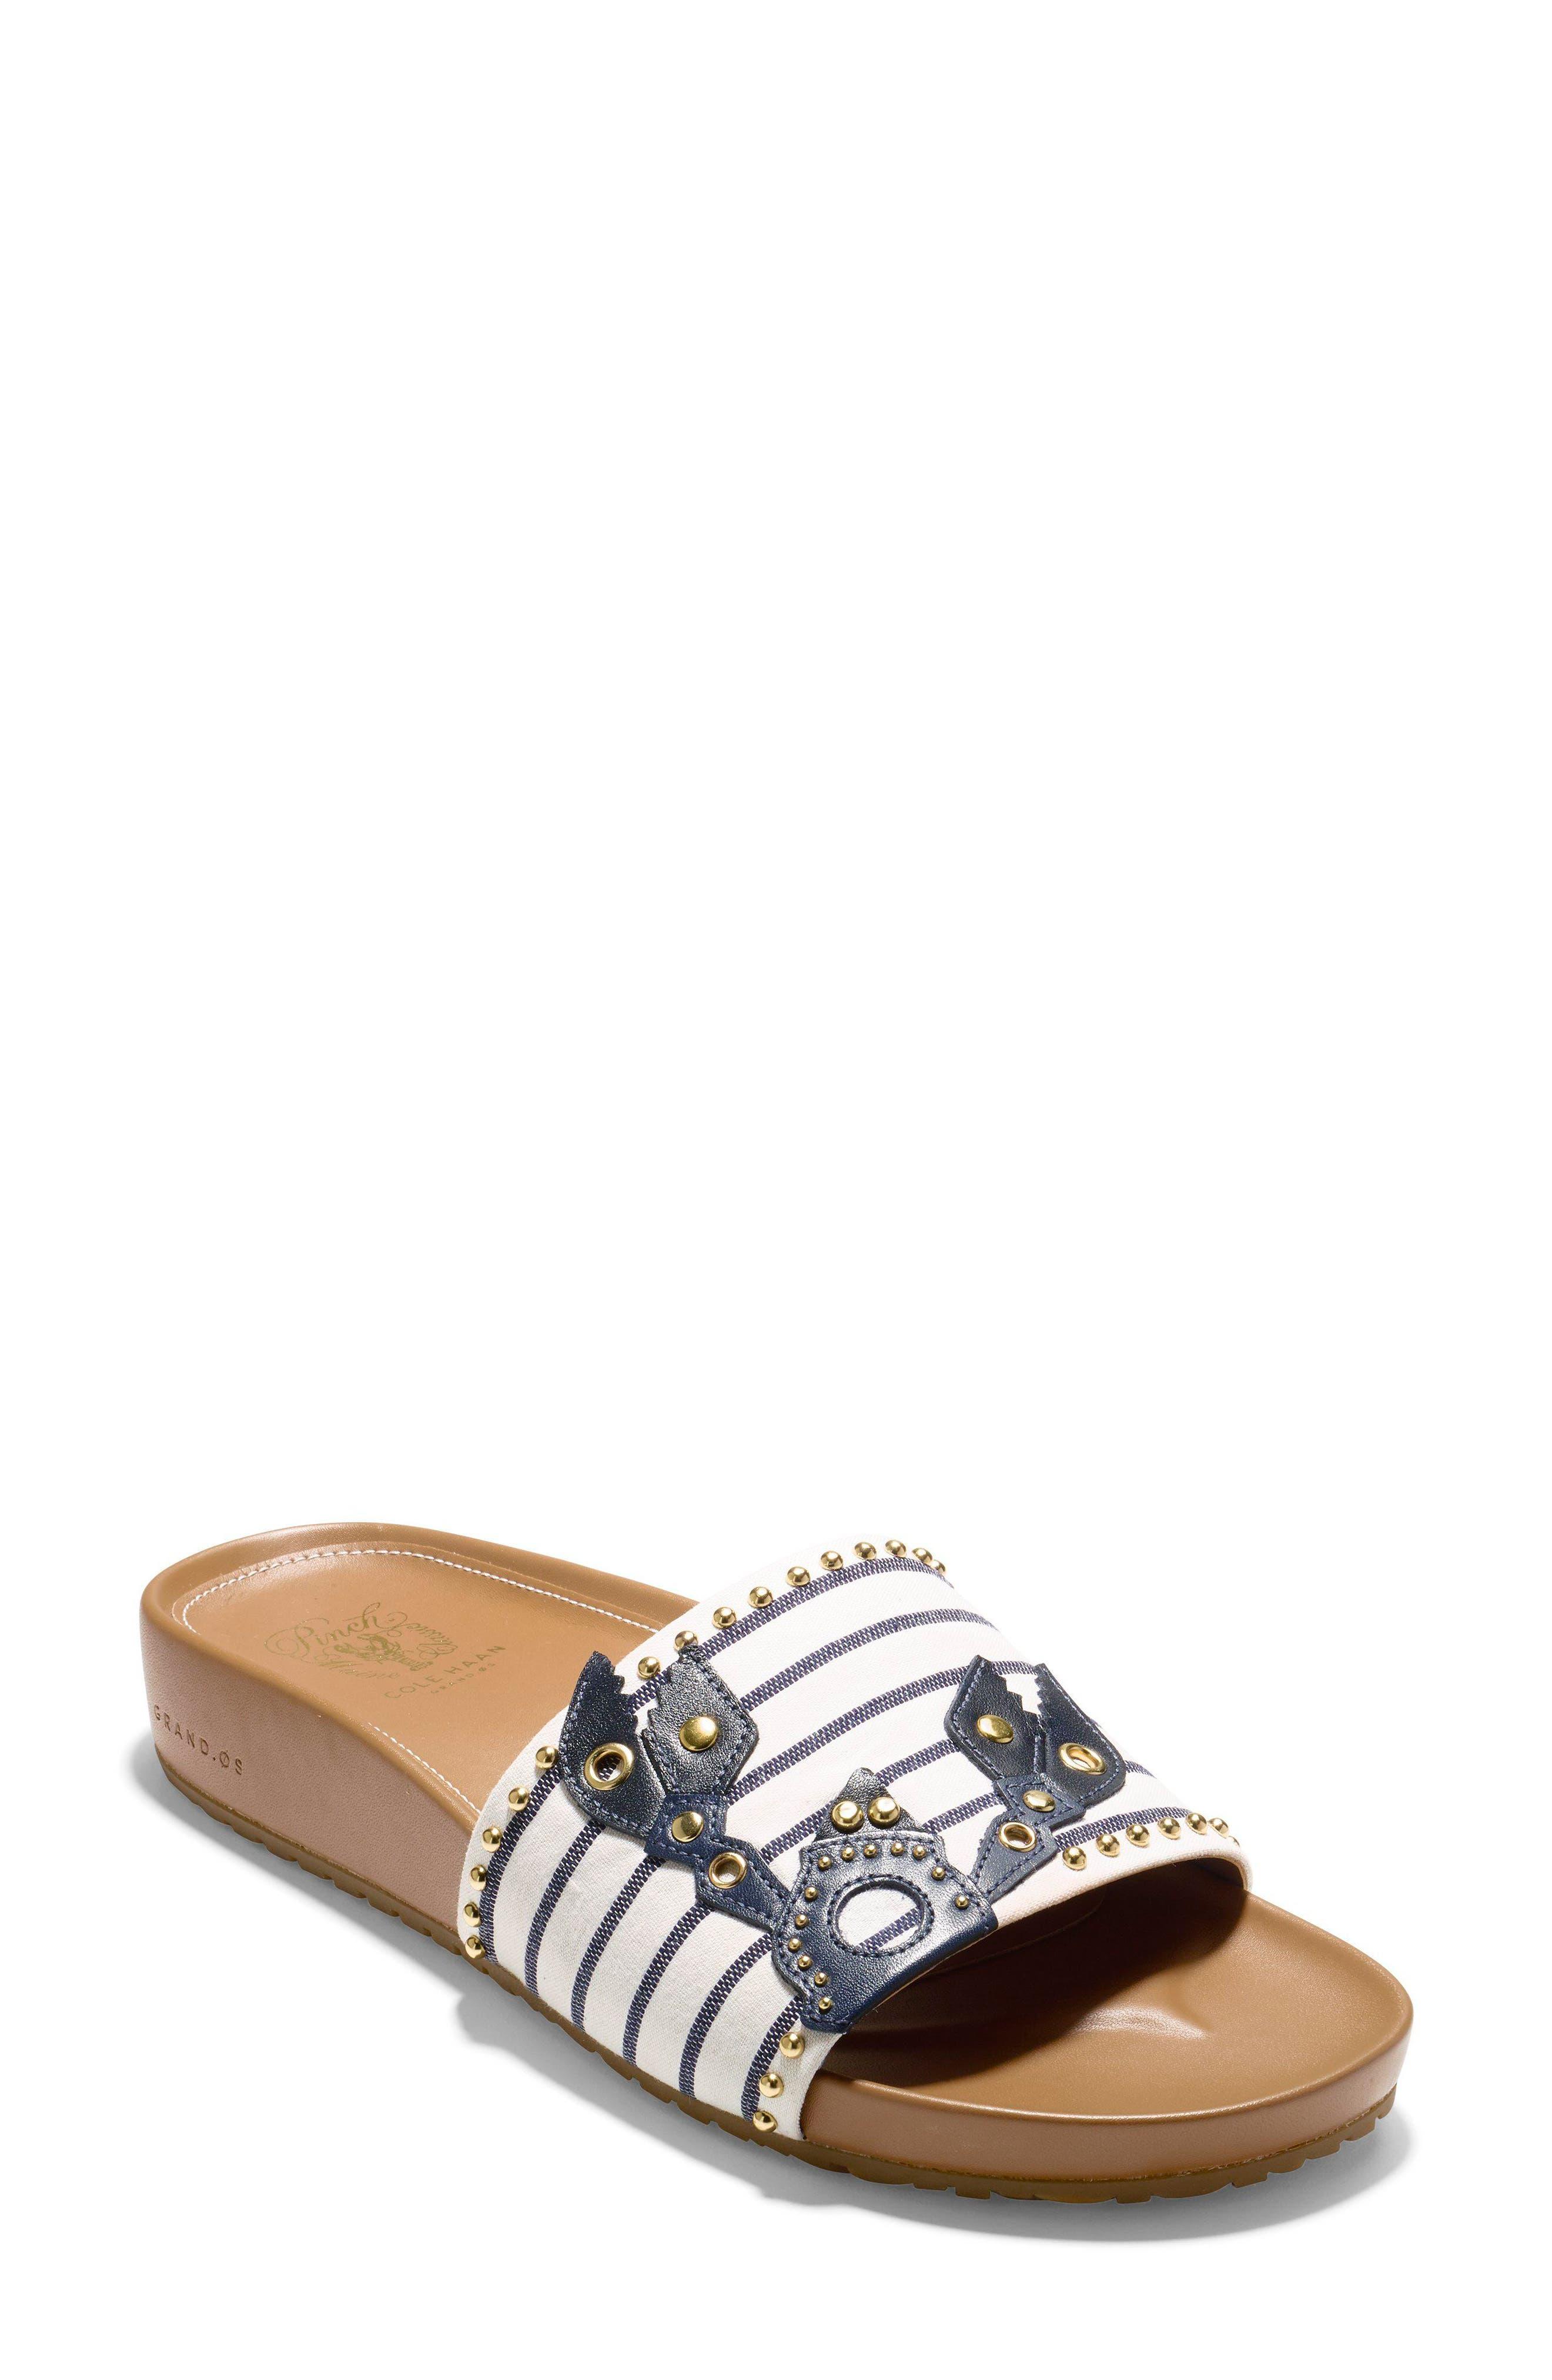 Pinch Montauk Lobster Slide Sandal,                             Main thumbnail 1, color,